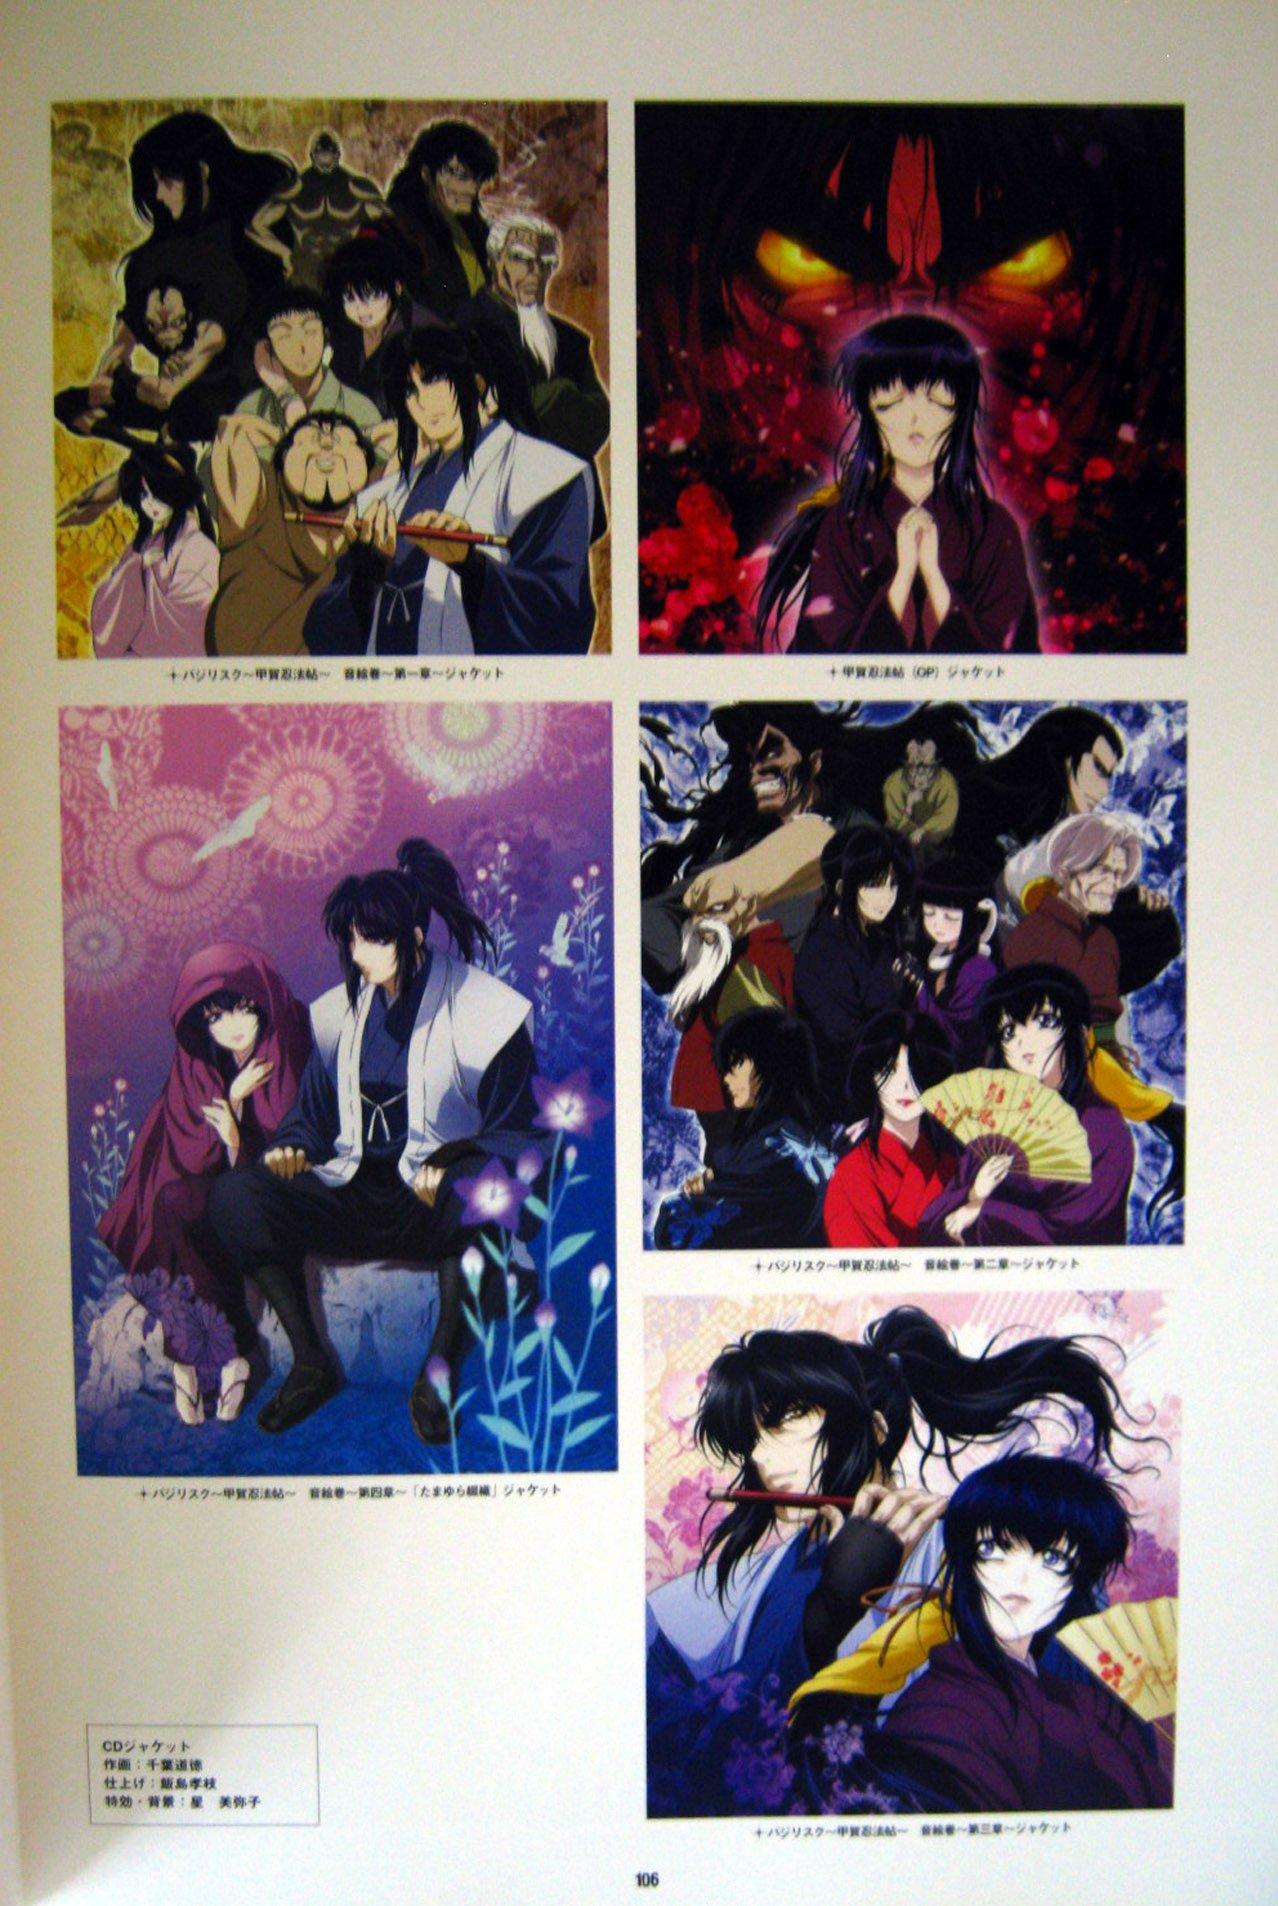 Amazon.com: Basilisk: The Kouga Ninja Scrolls Official Anime ...